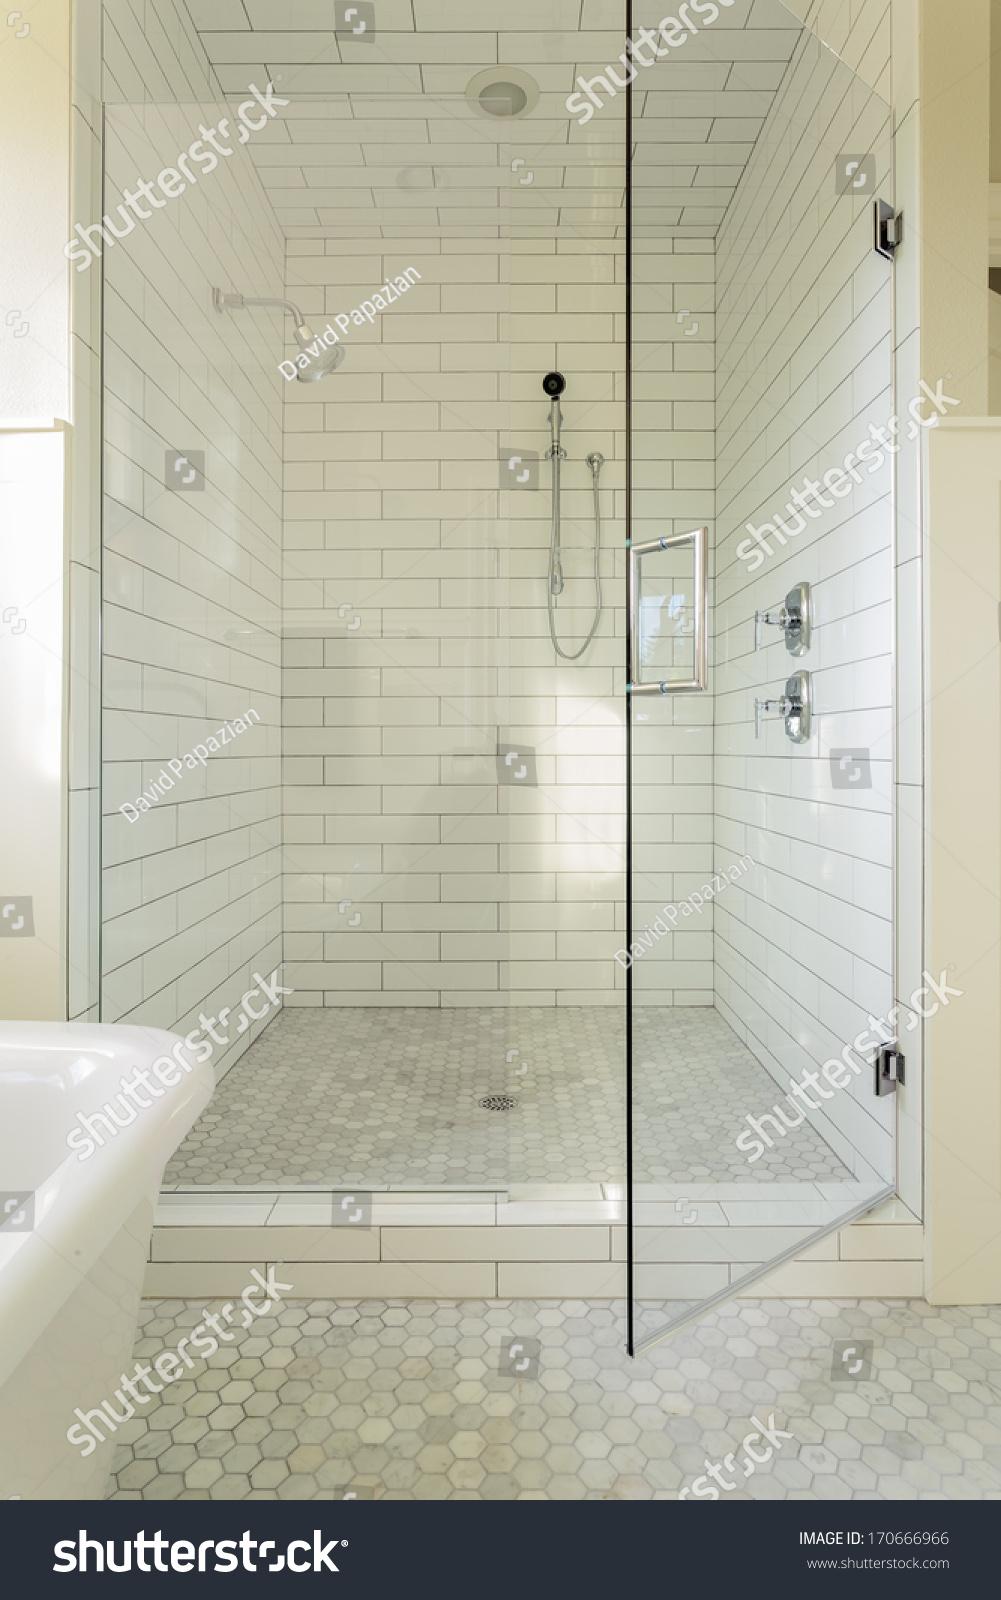 Vertical Shot White Tile Master Bathroom Stock Photo (Royalty Free ...